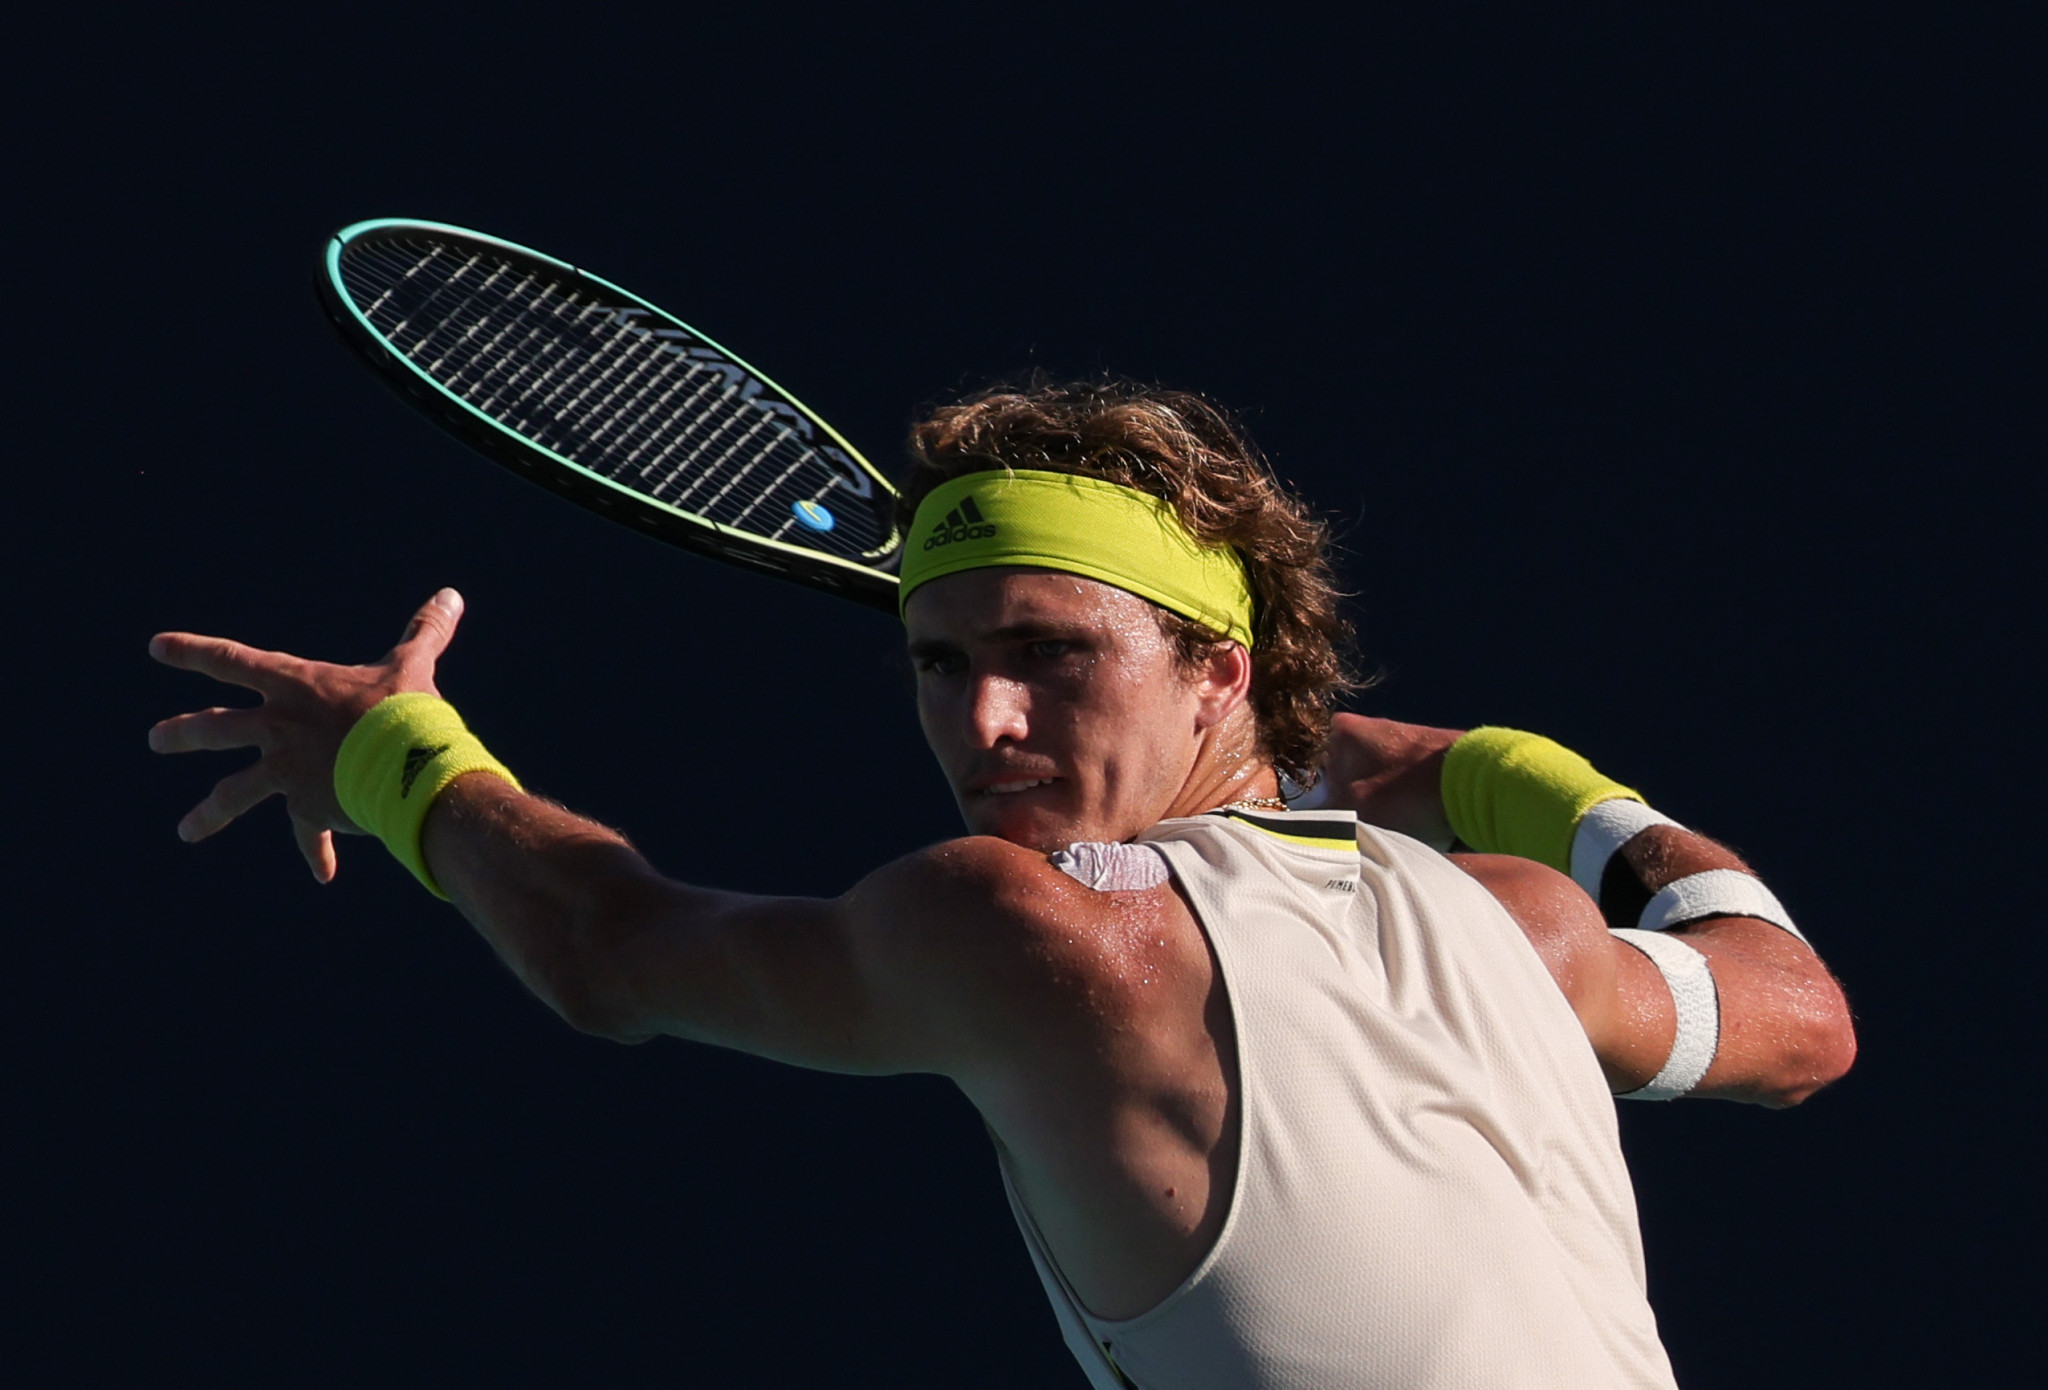 Zverev upset by Ruusuvuori as three top-10 seeds exit Miami Open men's singles